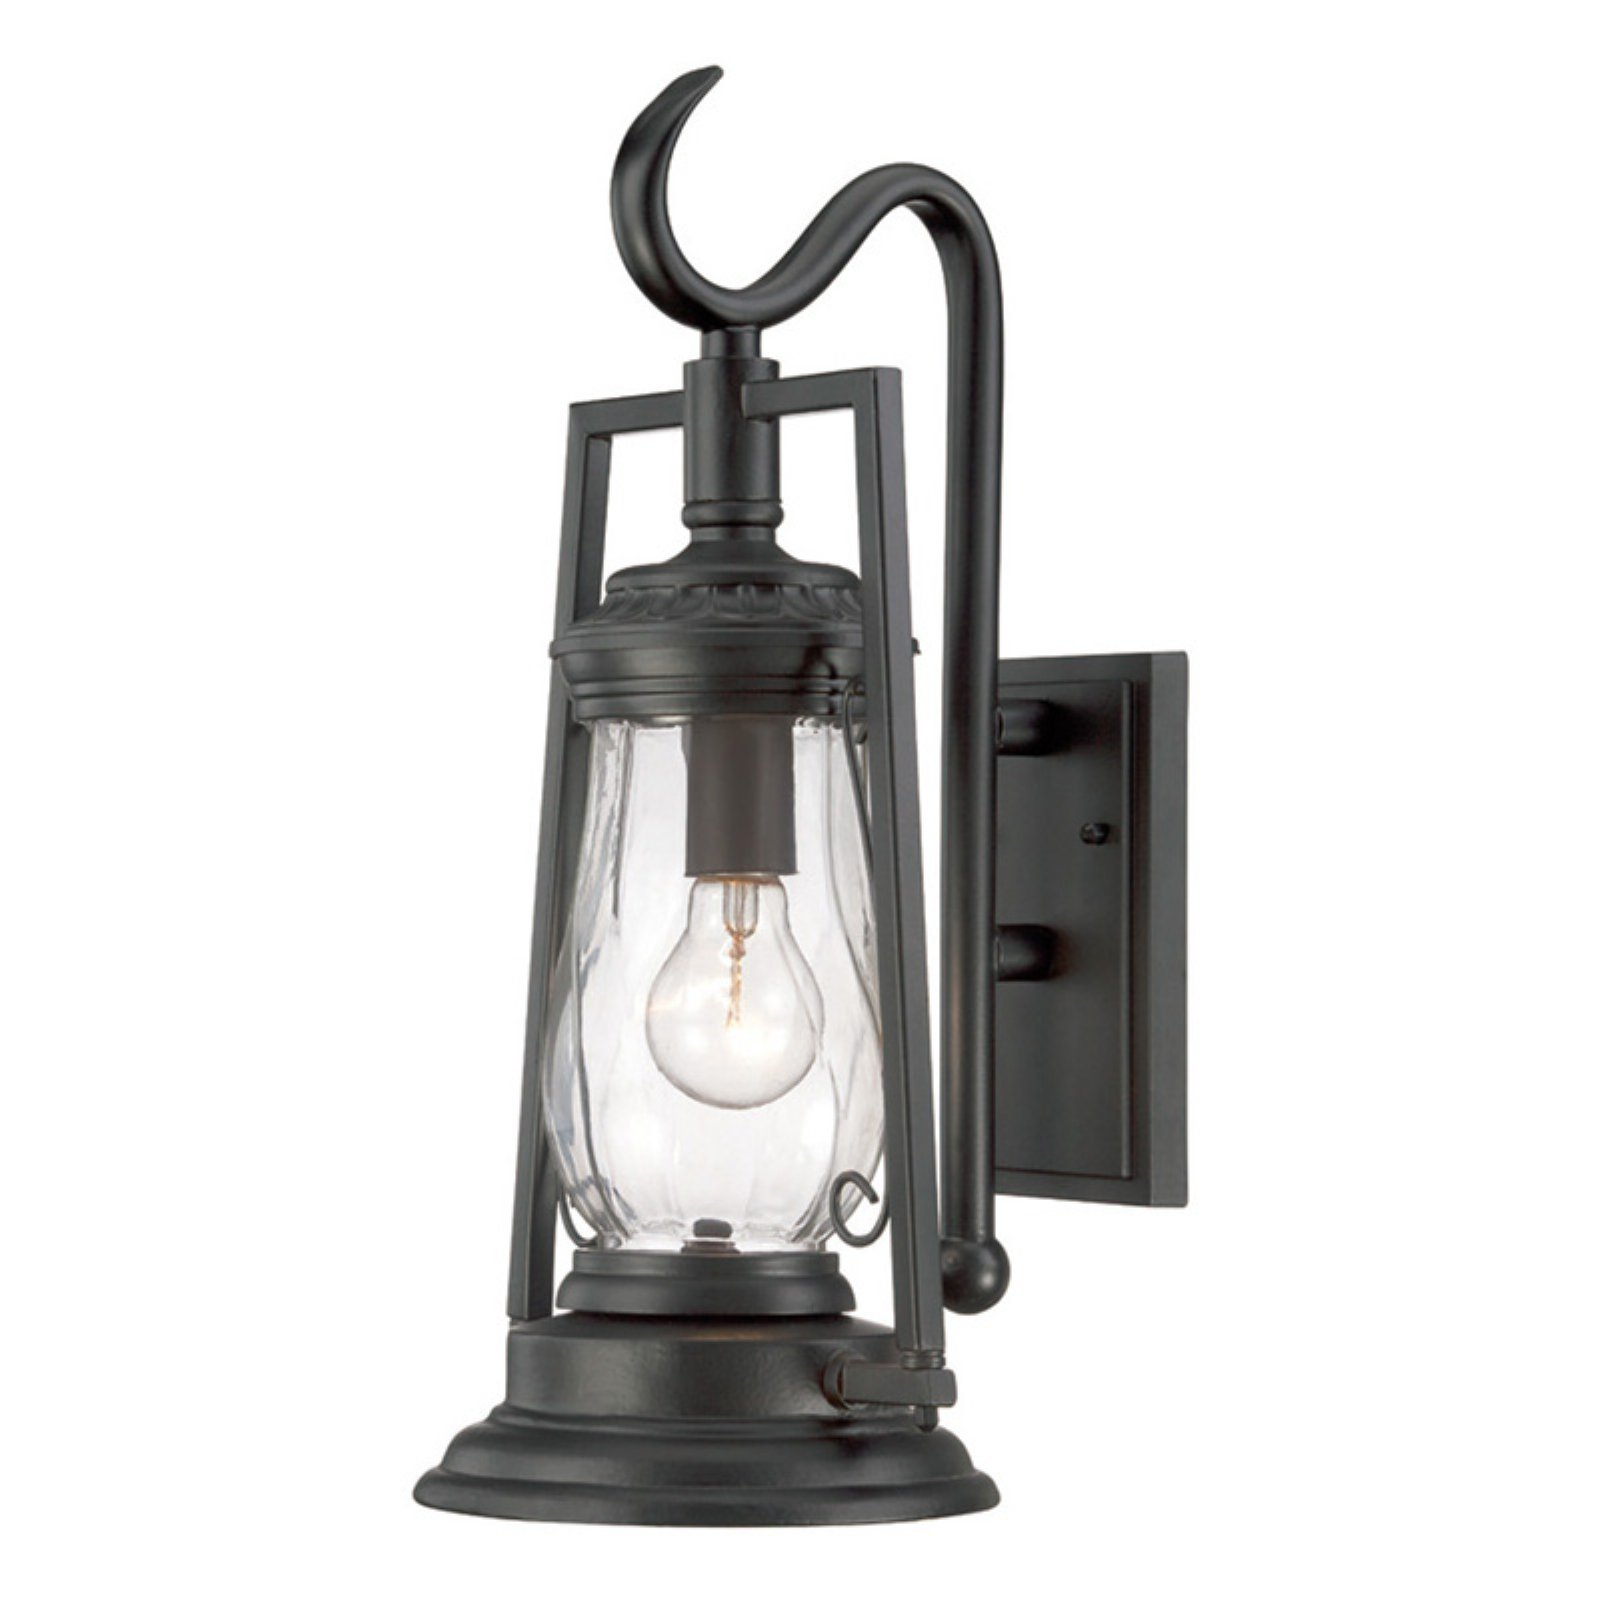 Acclaim Lighting Kero Outdoor Wall Mount Light Fixture